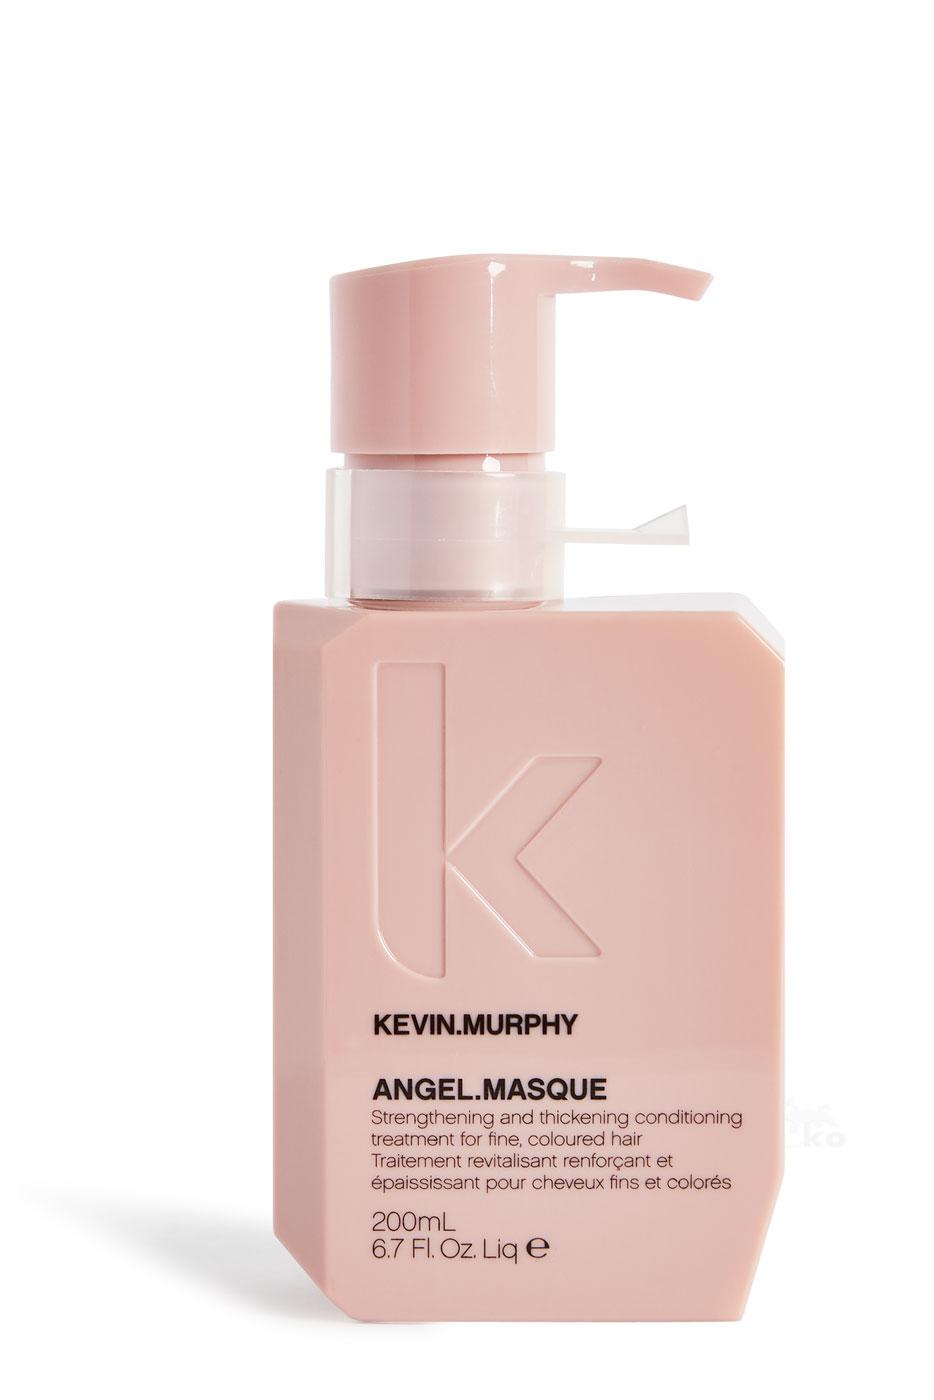 KEVIN.MURPHY ANGEL.MASQUE 200 ml